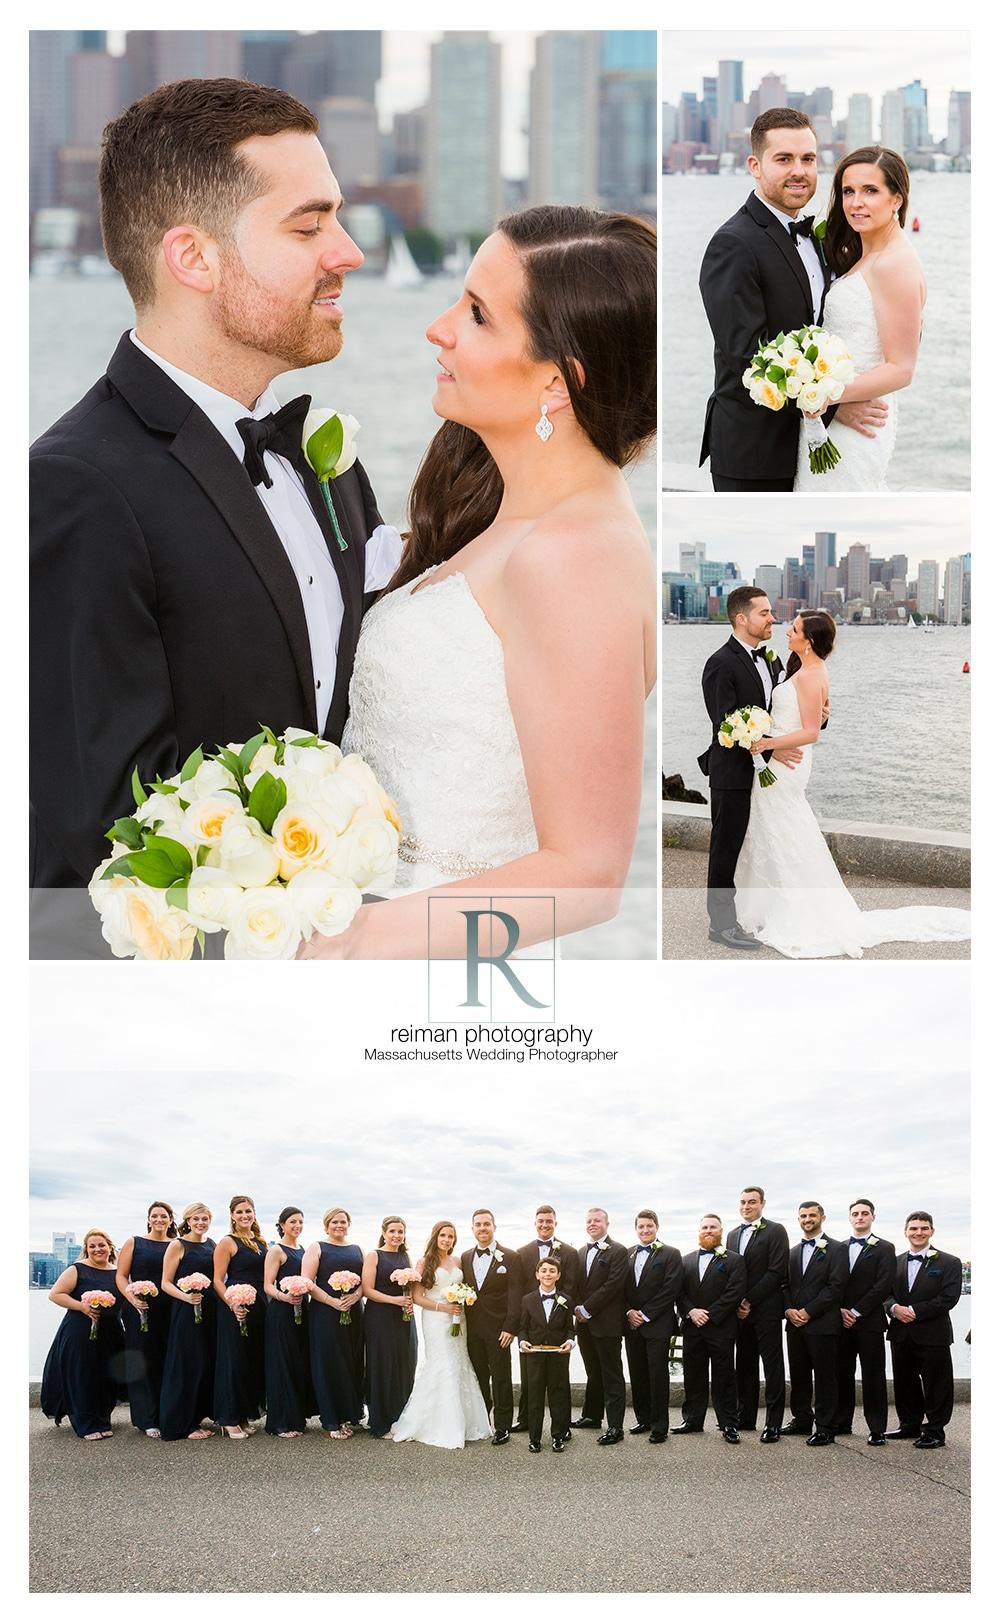 Hyatt Regency Boston Harbor Hotel, Wedding, Spring, Boston Wedding